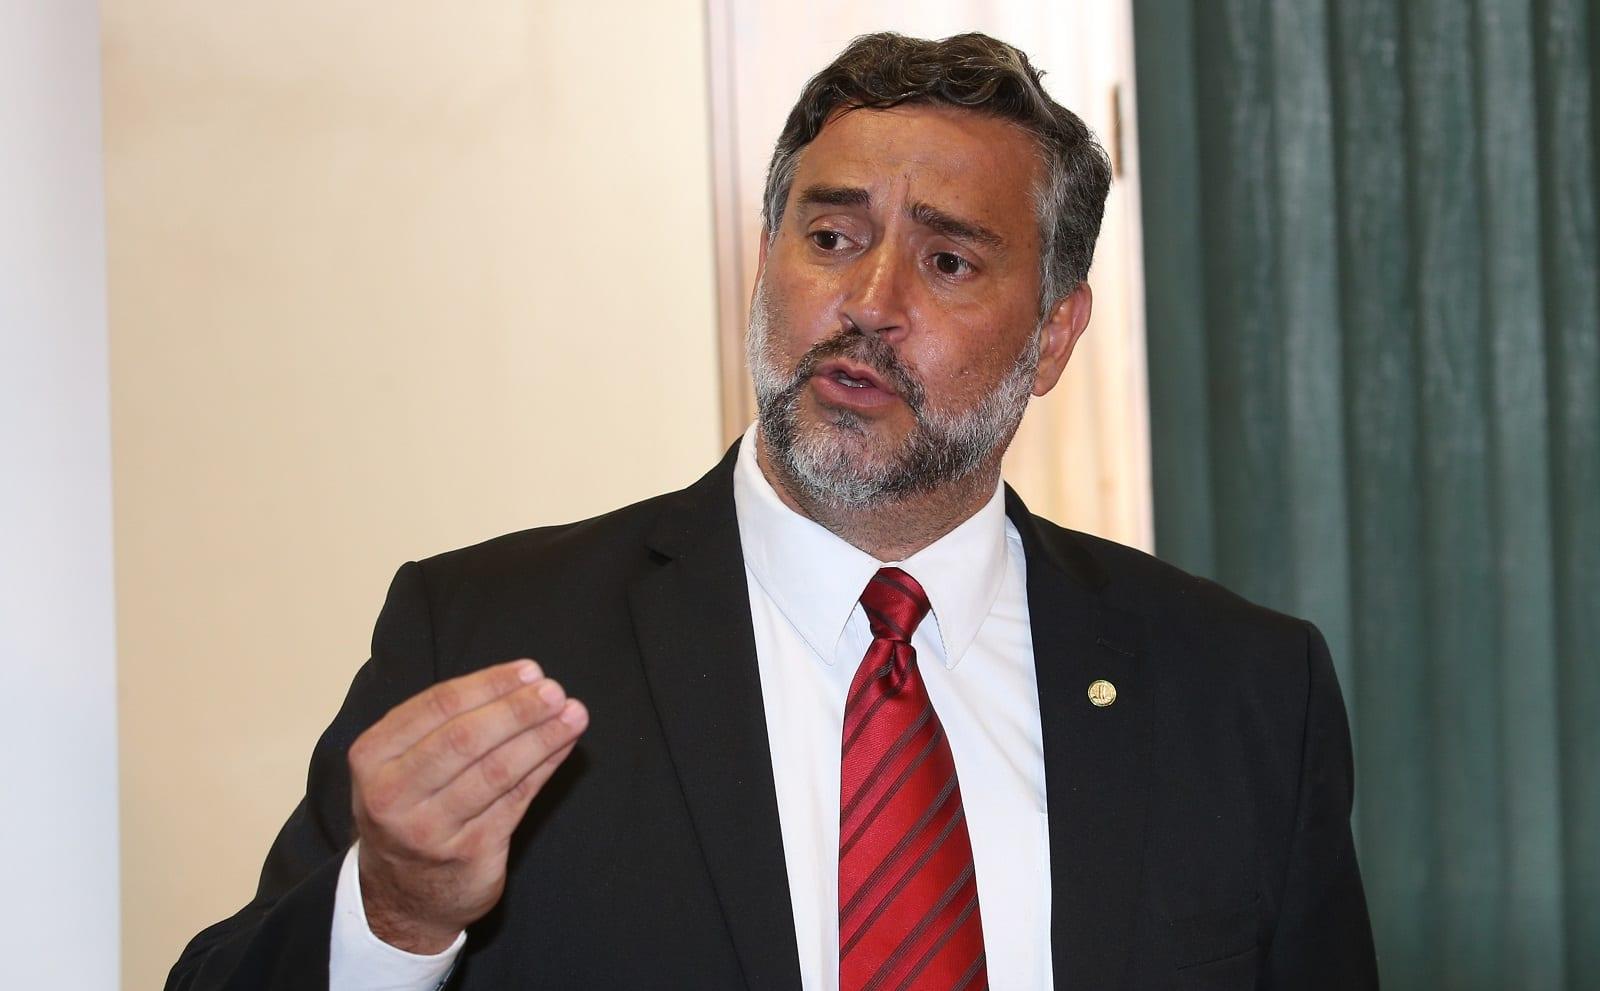 O Deputado Paulo Pimenta (PT-RS) (Foto Lula Marques/Agência PT)